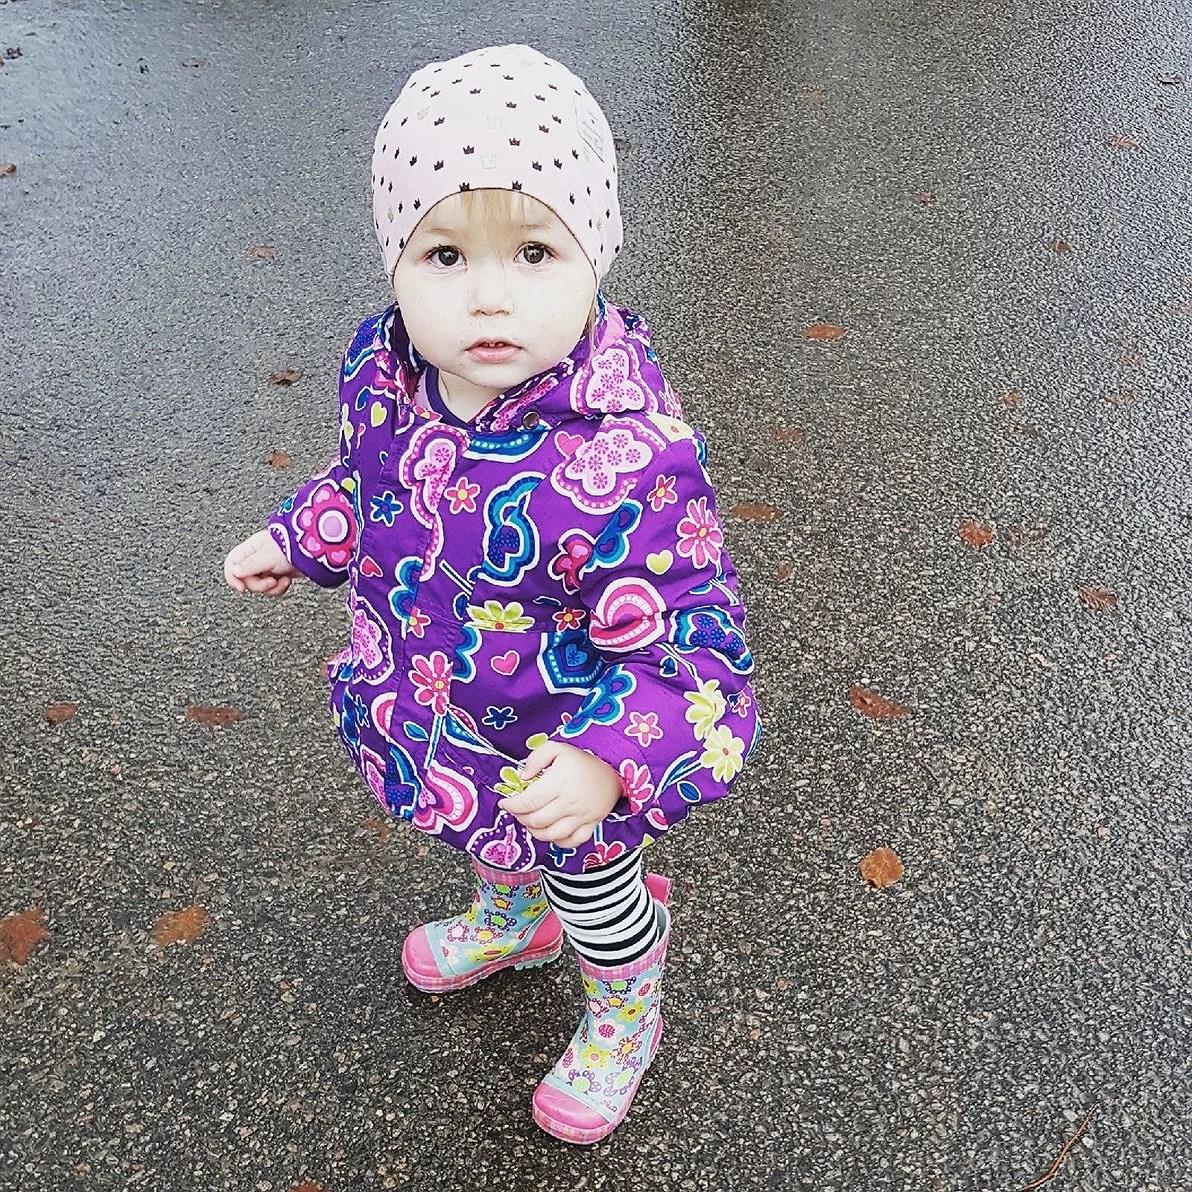 Mer regn?